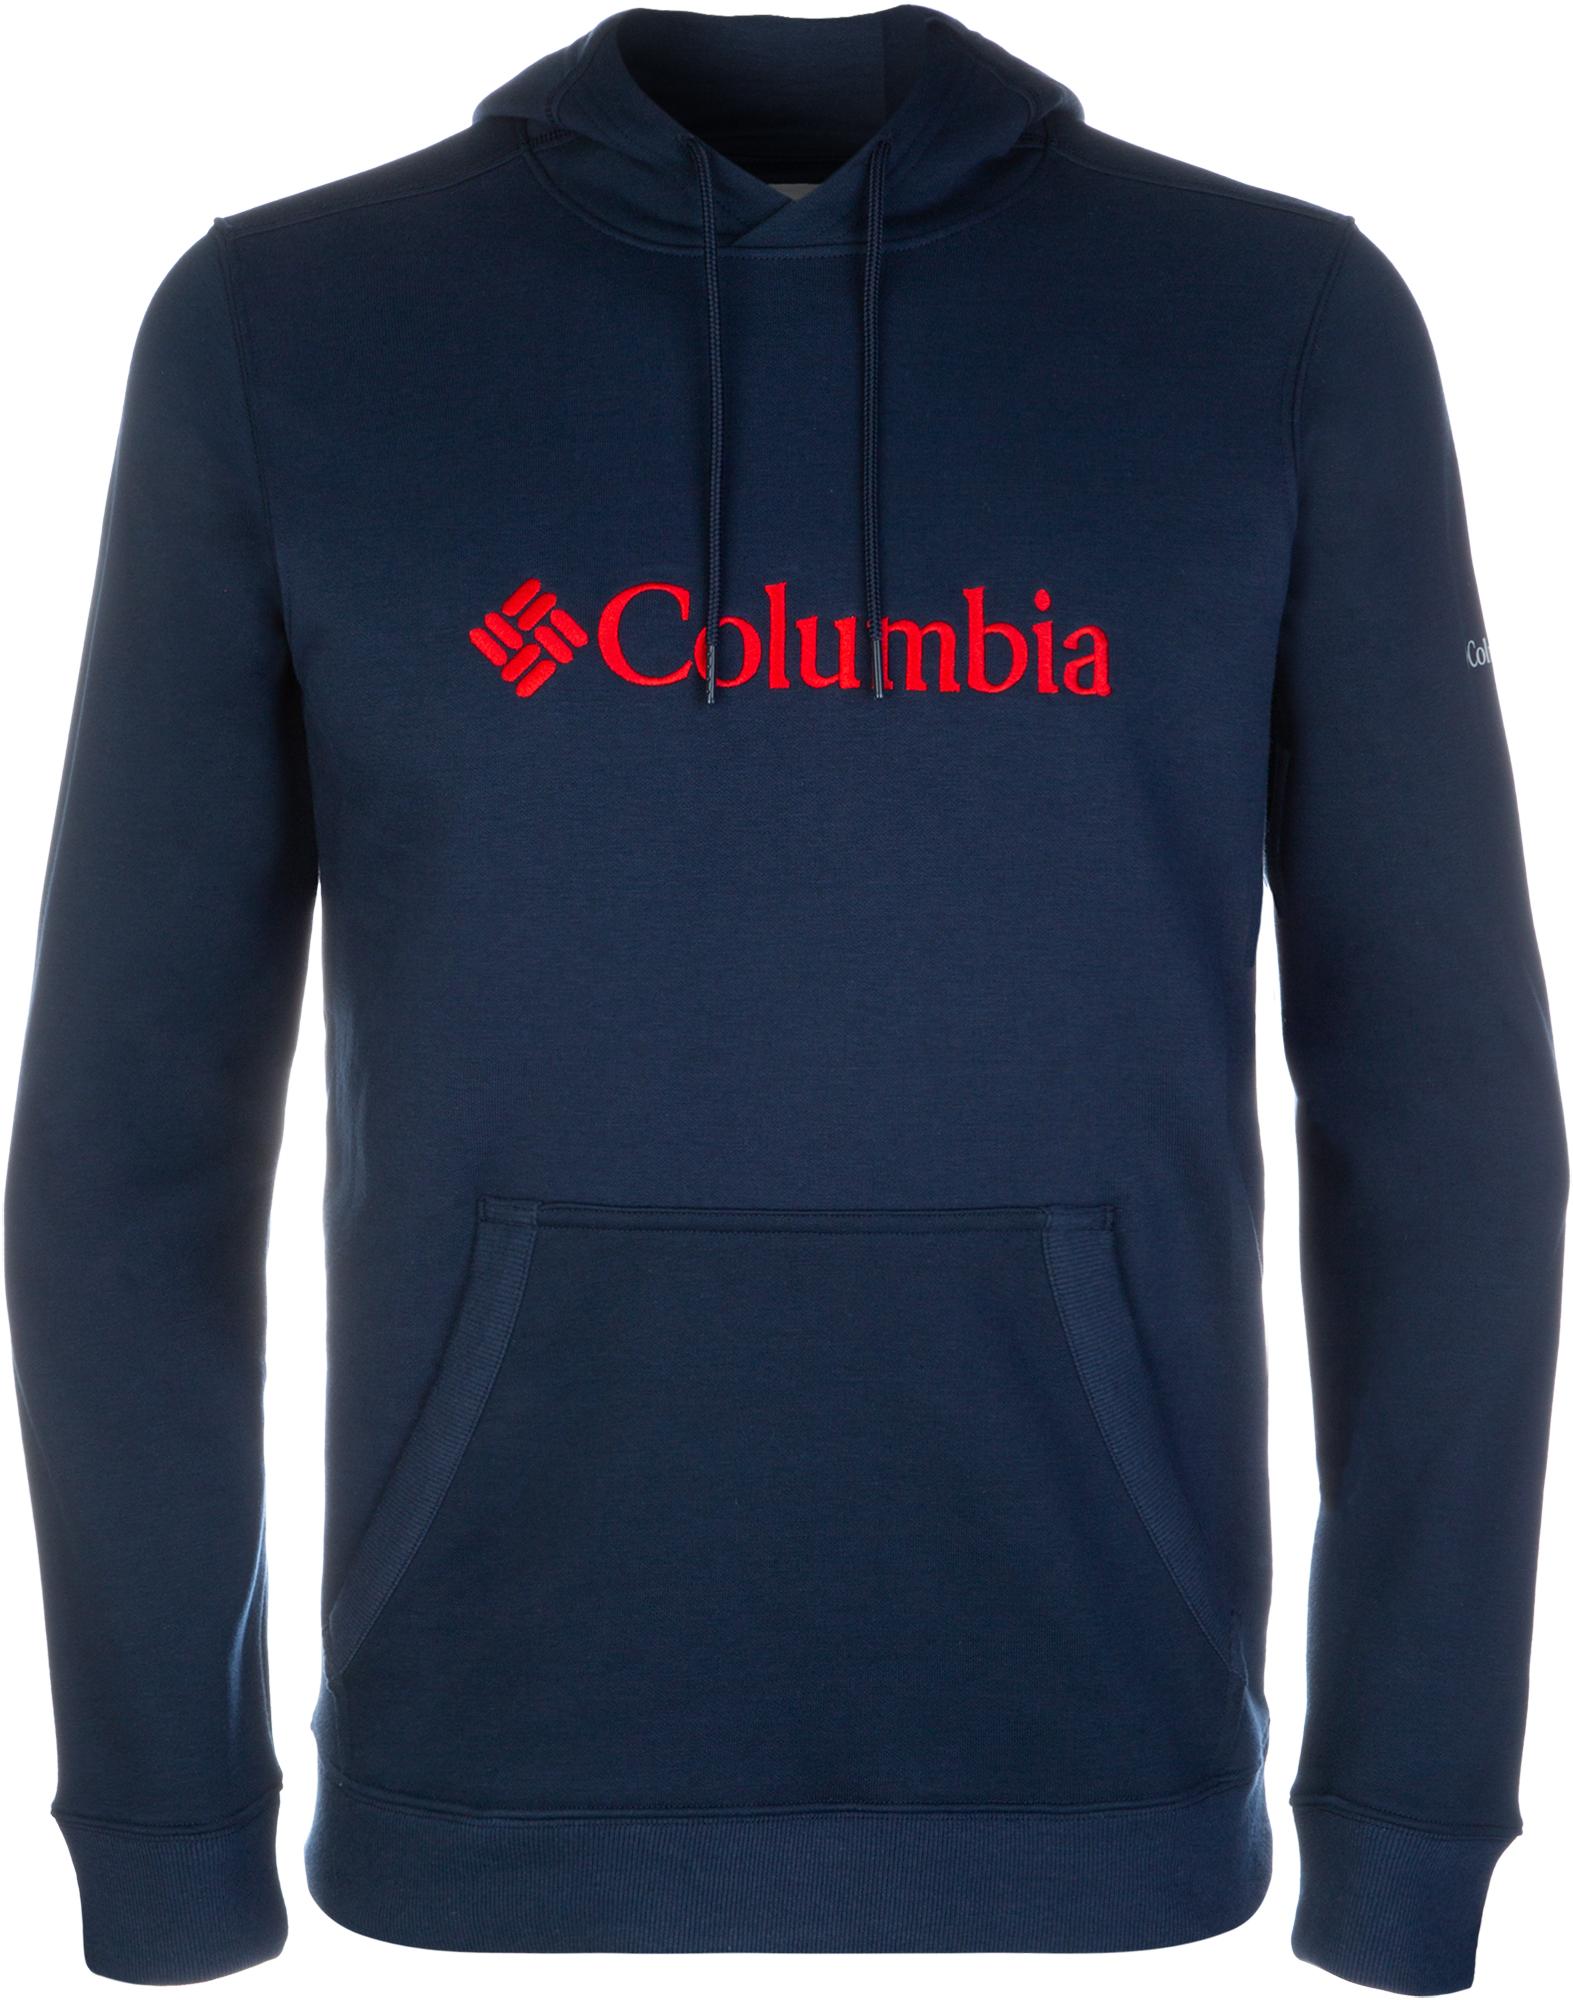 Columbia Худи мужская CSC Basic Logo II, размер 56-58